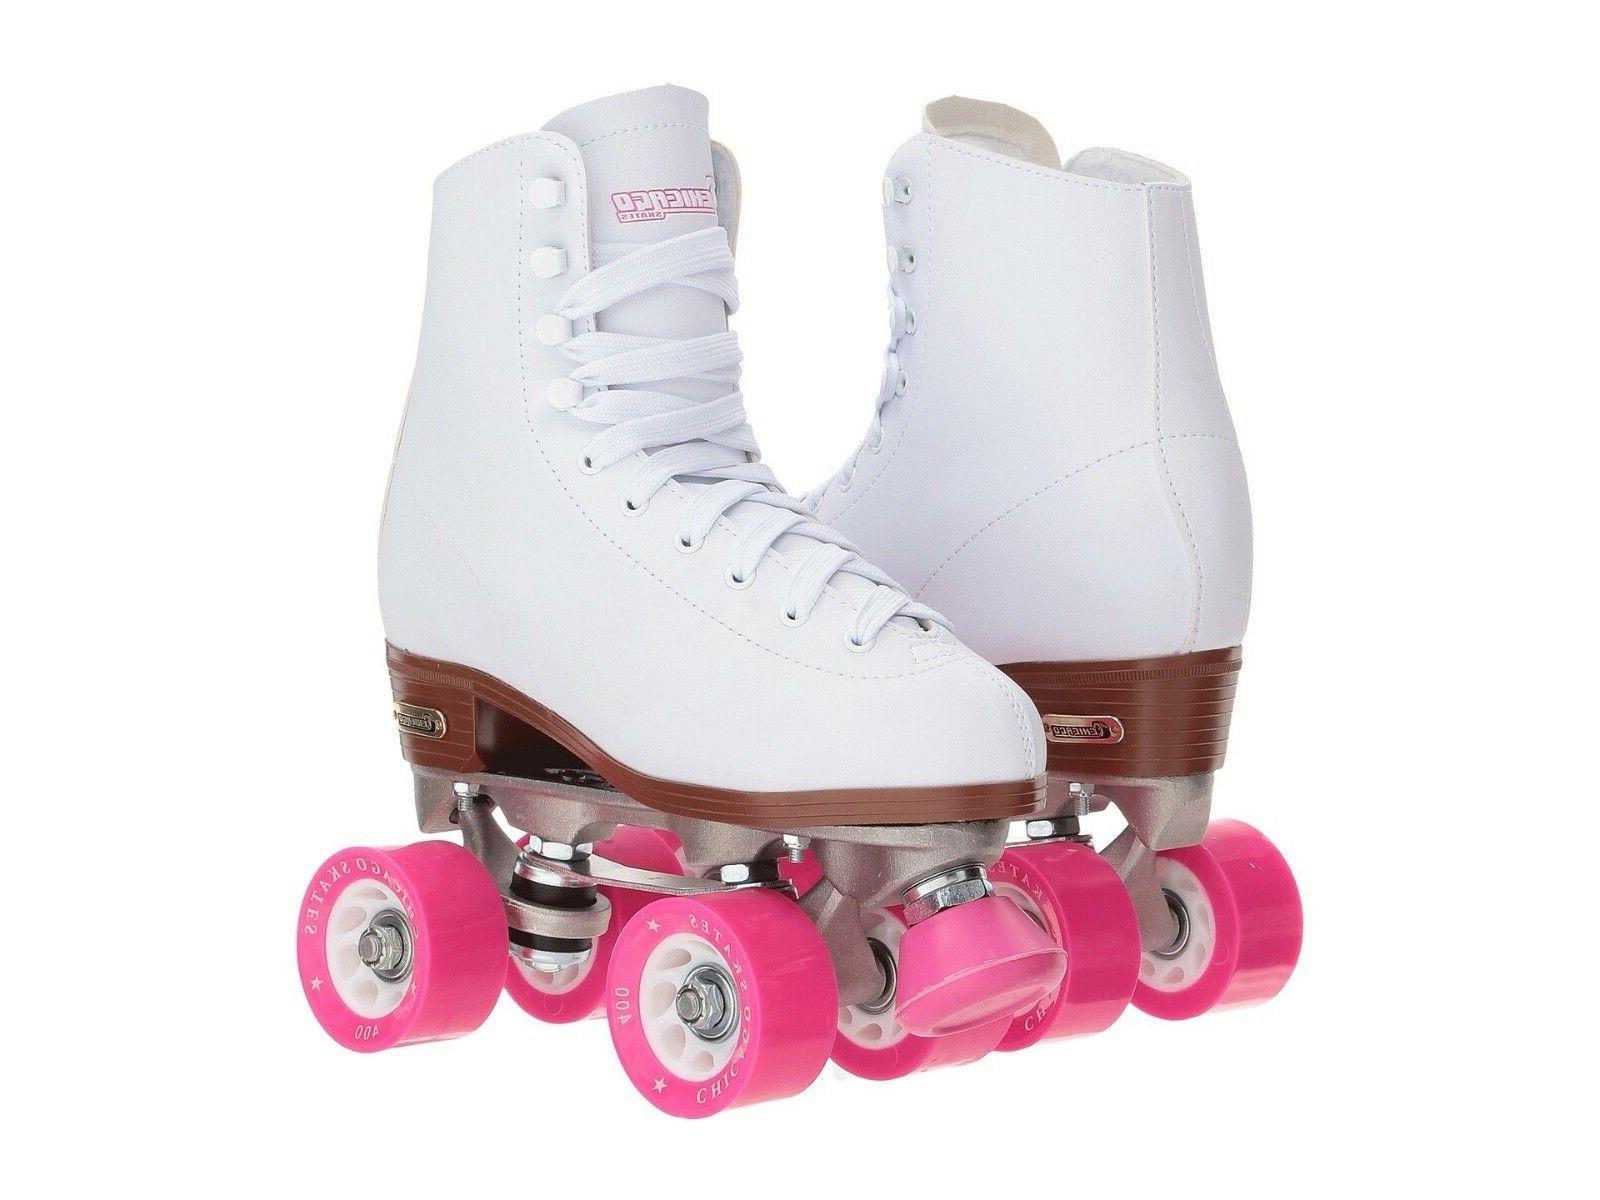 400 indoor outdoor roller skates traditional high